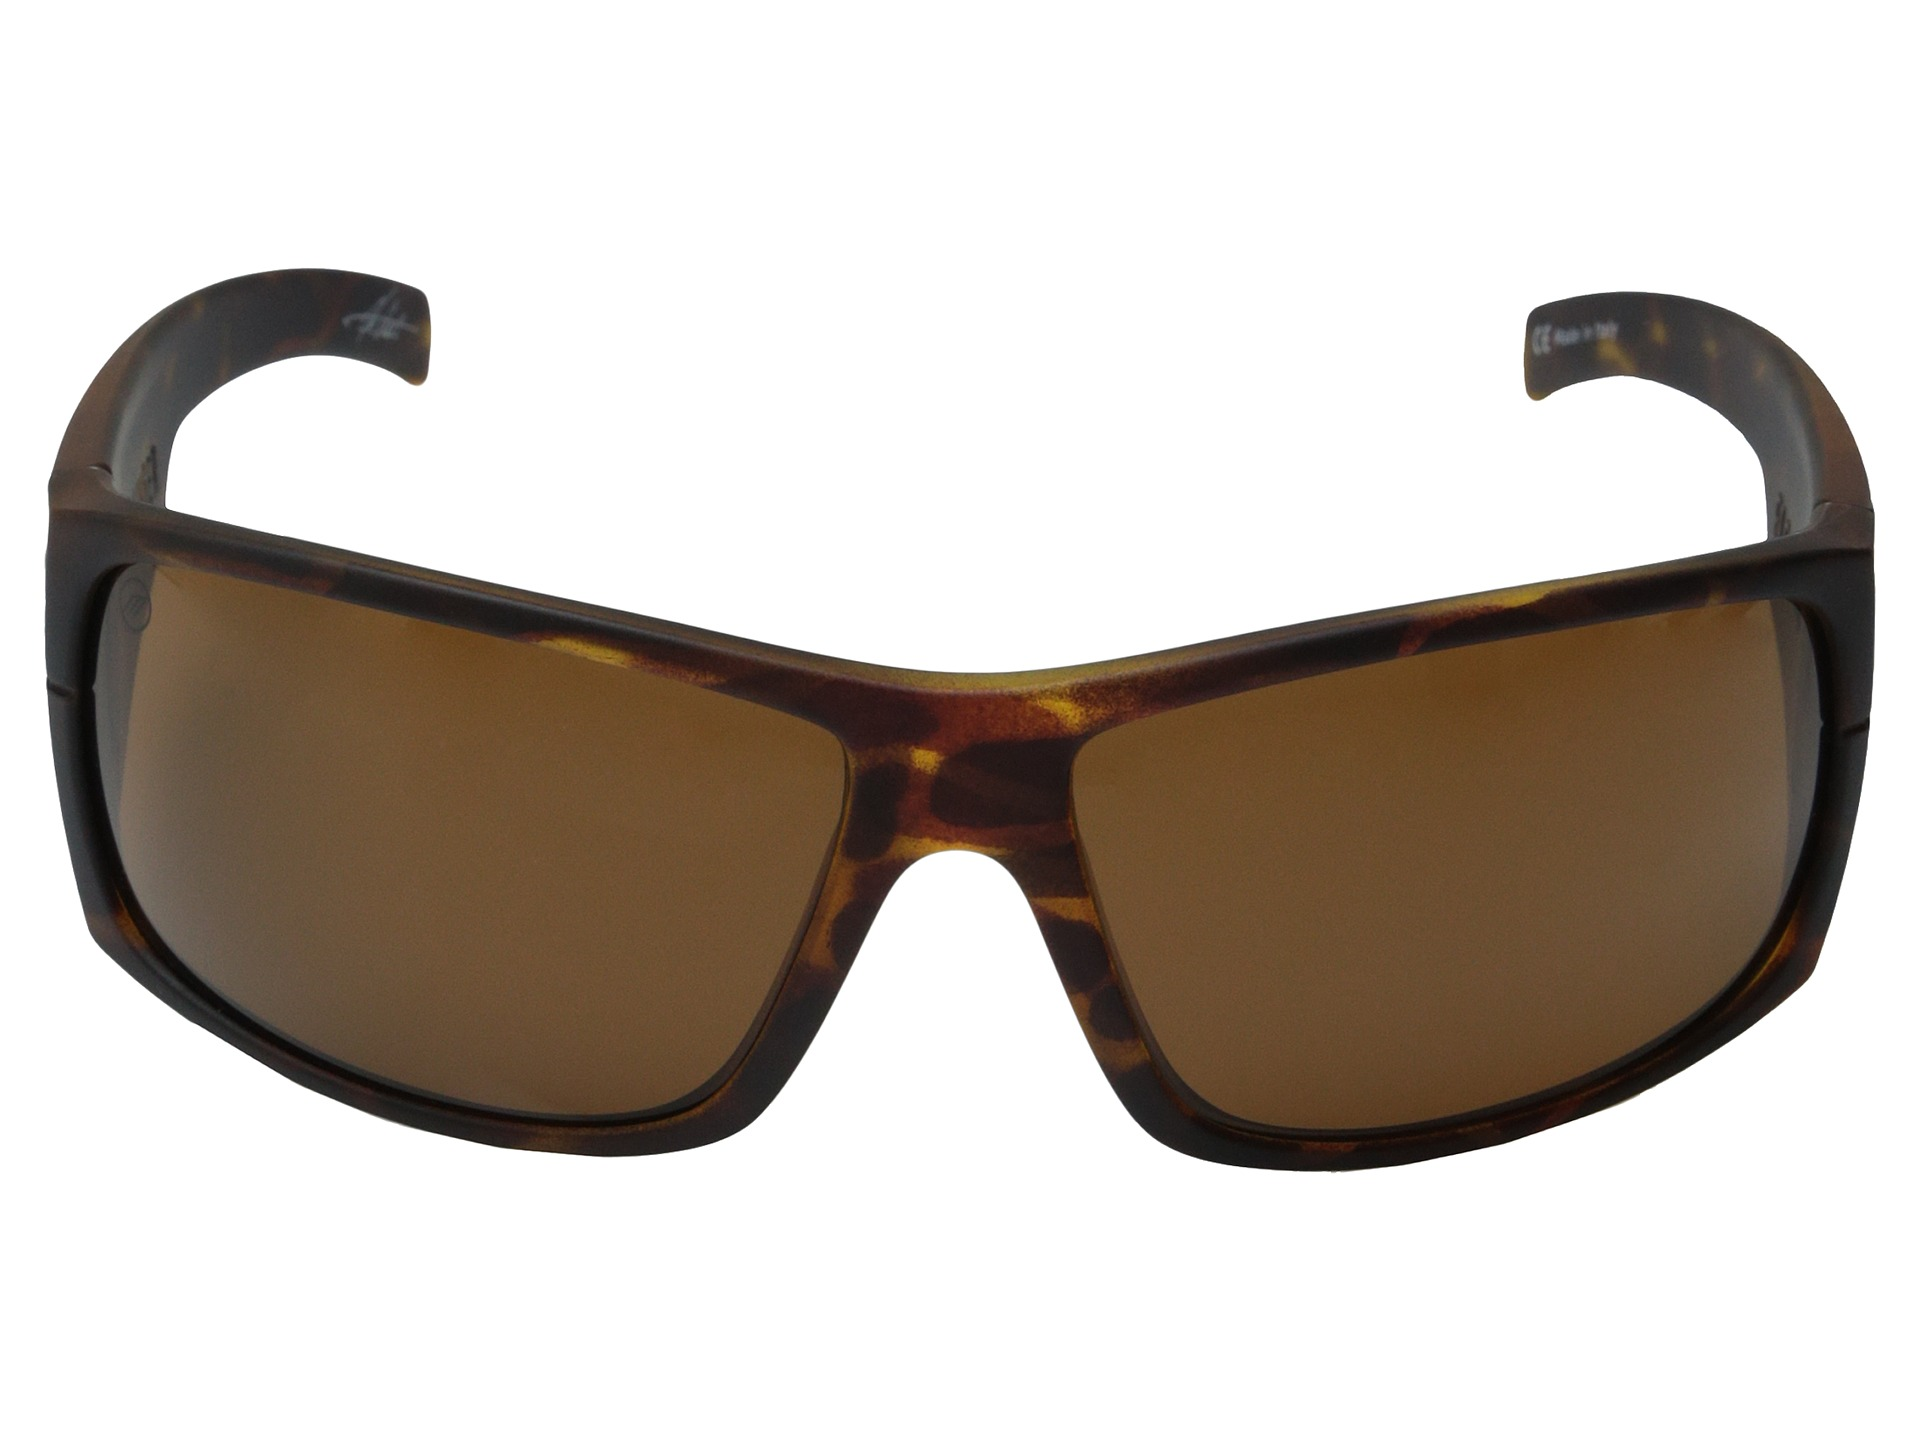 4635b618de Electric Eyewear Mudslinger Polarized at www.semadatacoop.org